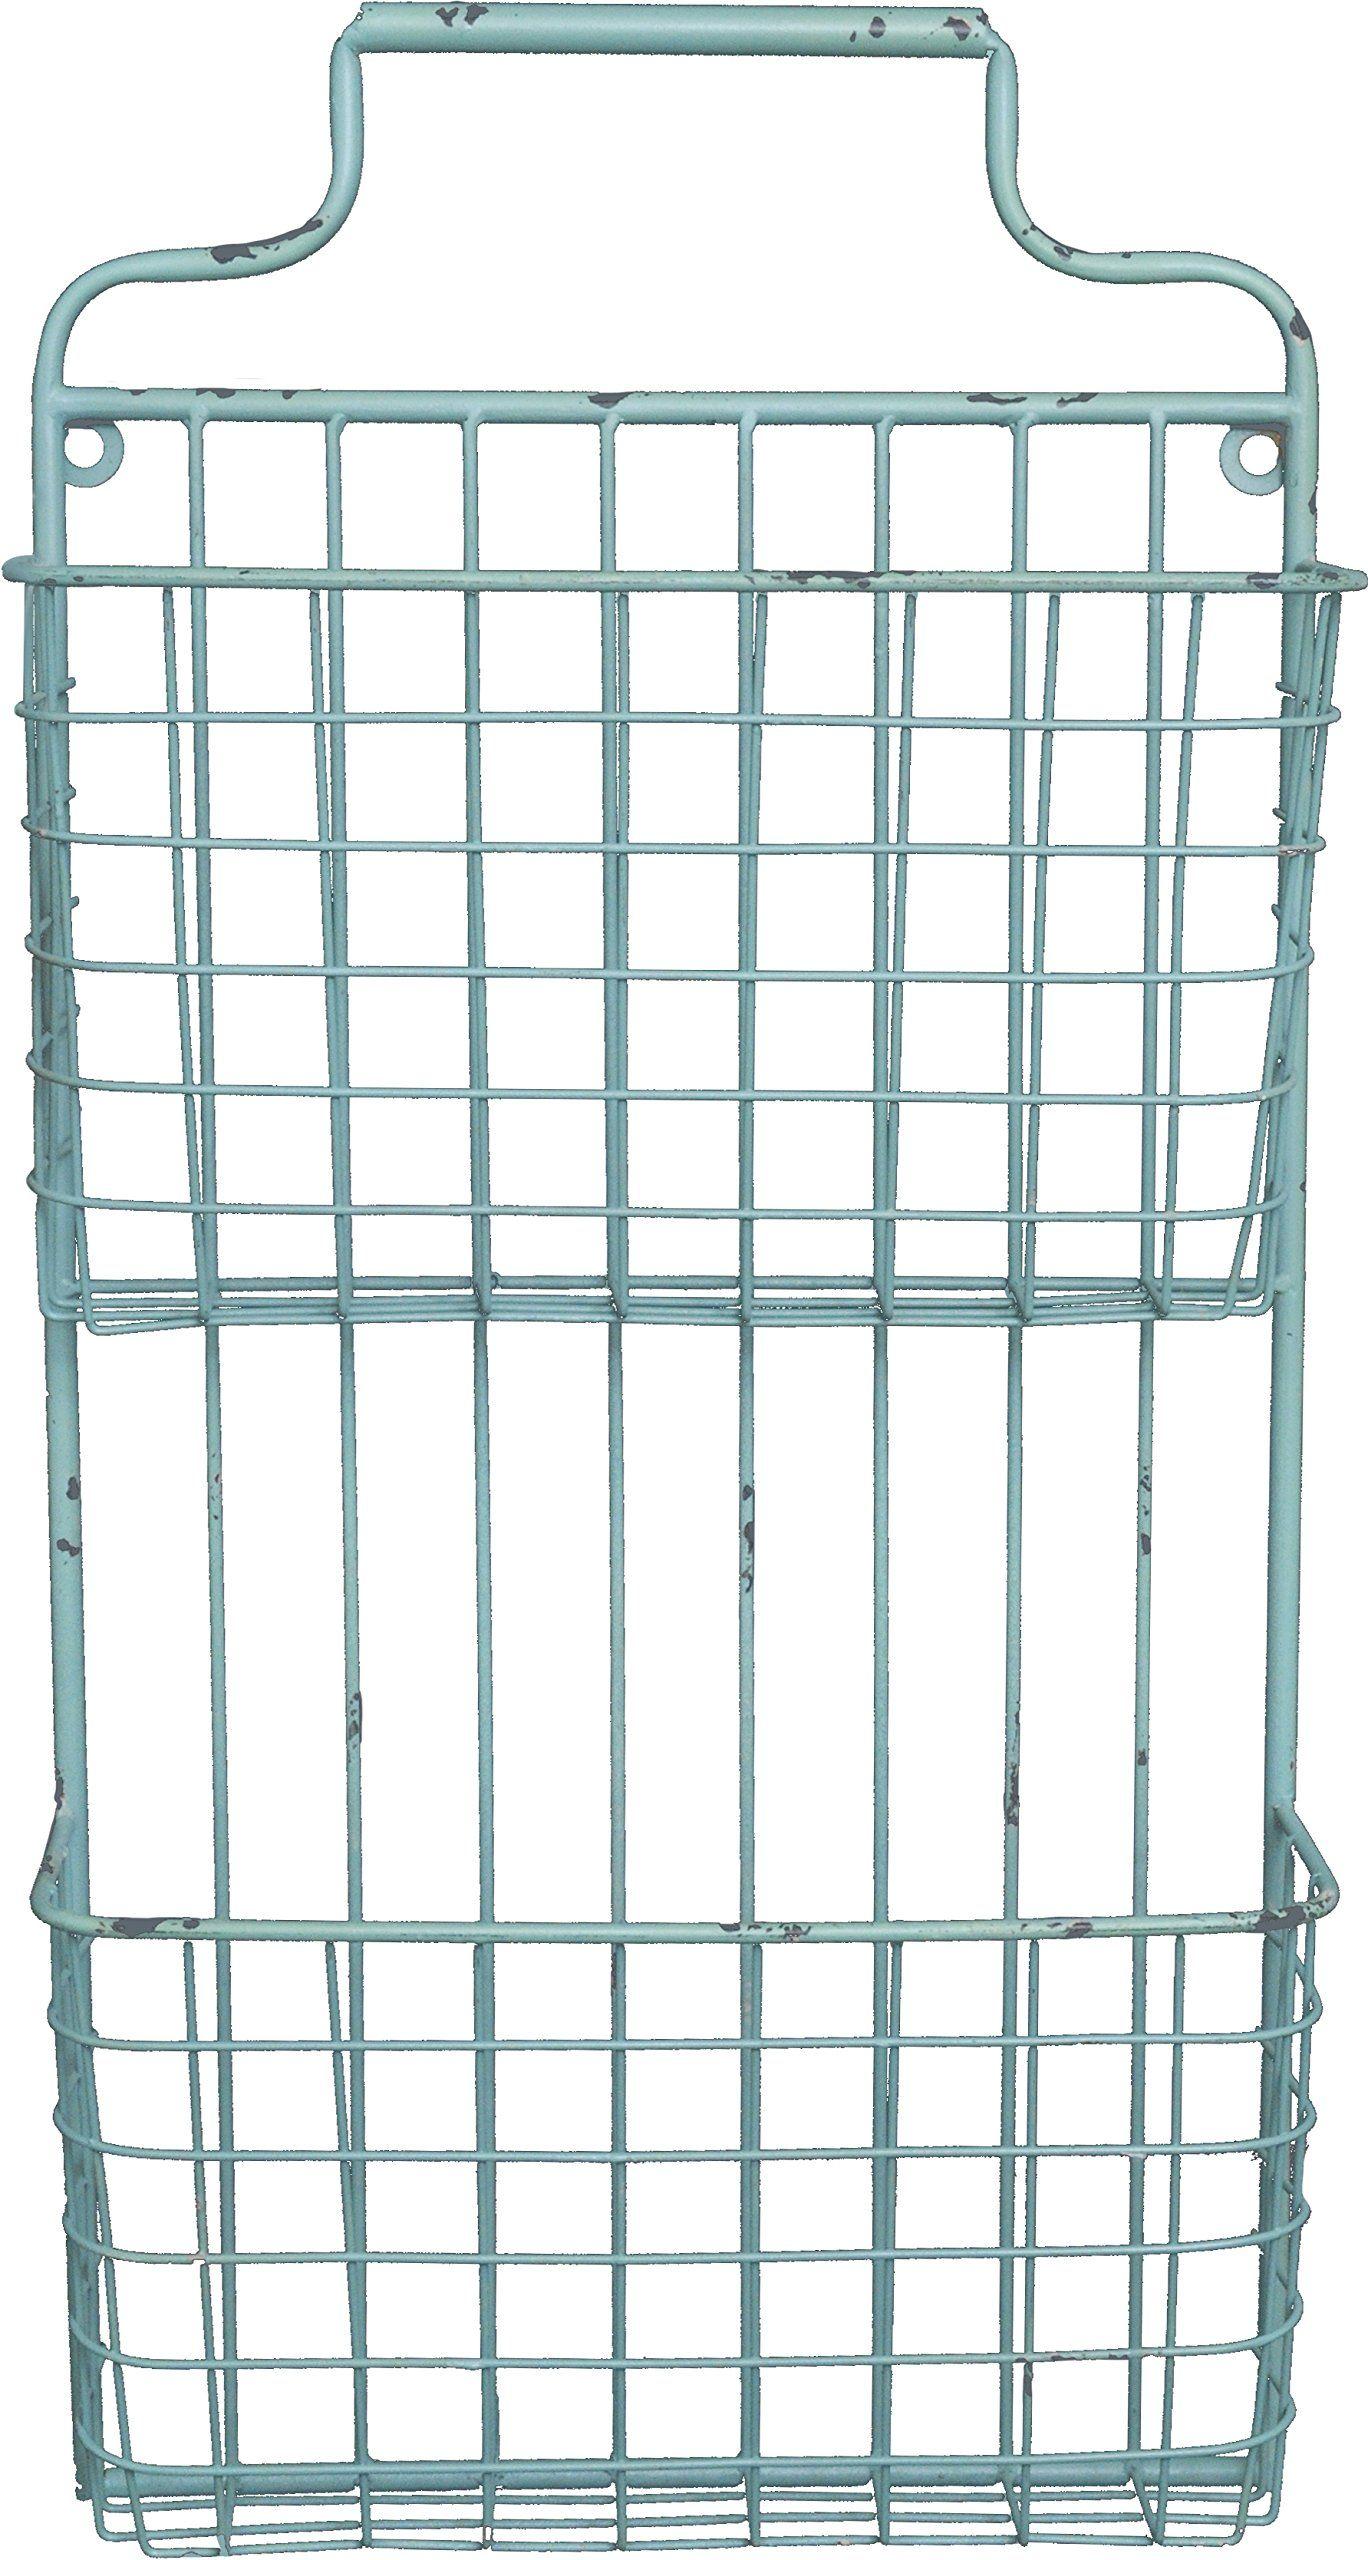 Oxygensensorwiringdiagramboscho2sensorwiringboscho2sensor Wiring Peugeot 206 Horn Fuse Location Metal Wire Wall File Holder Center U2022